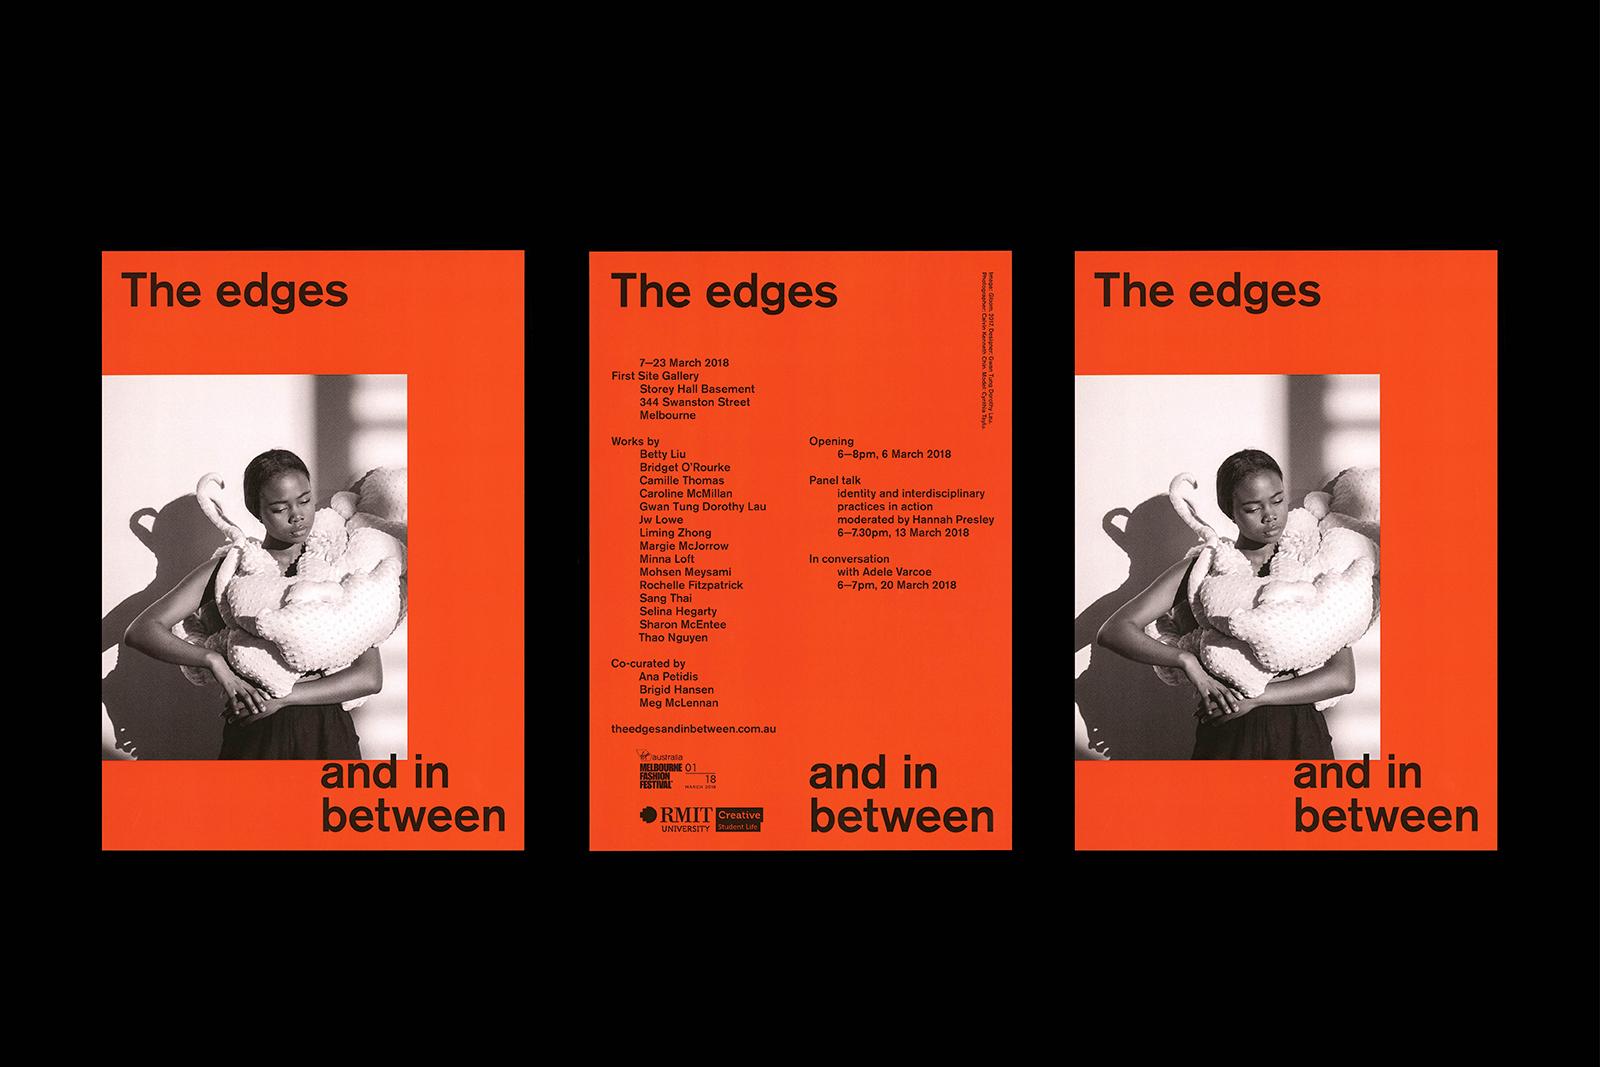 the_edges_and_in_between_megmclennan_print_invitation.jpg